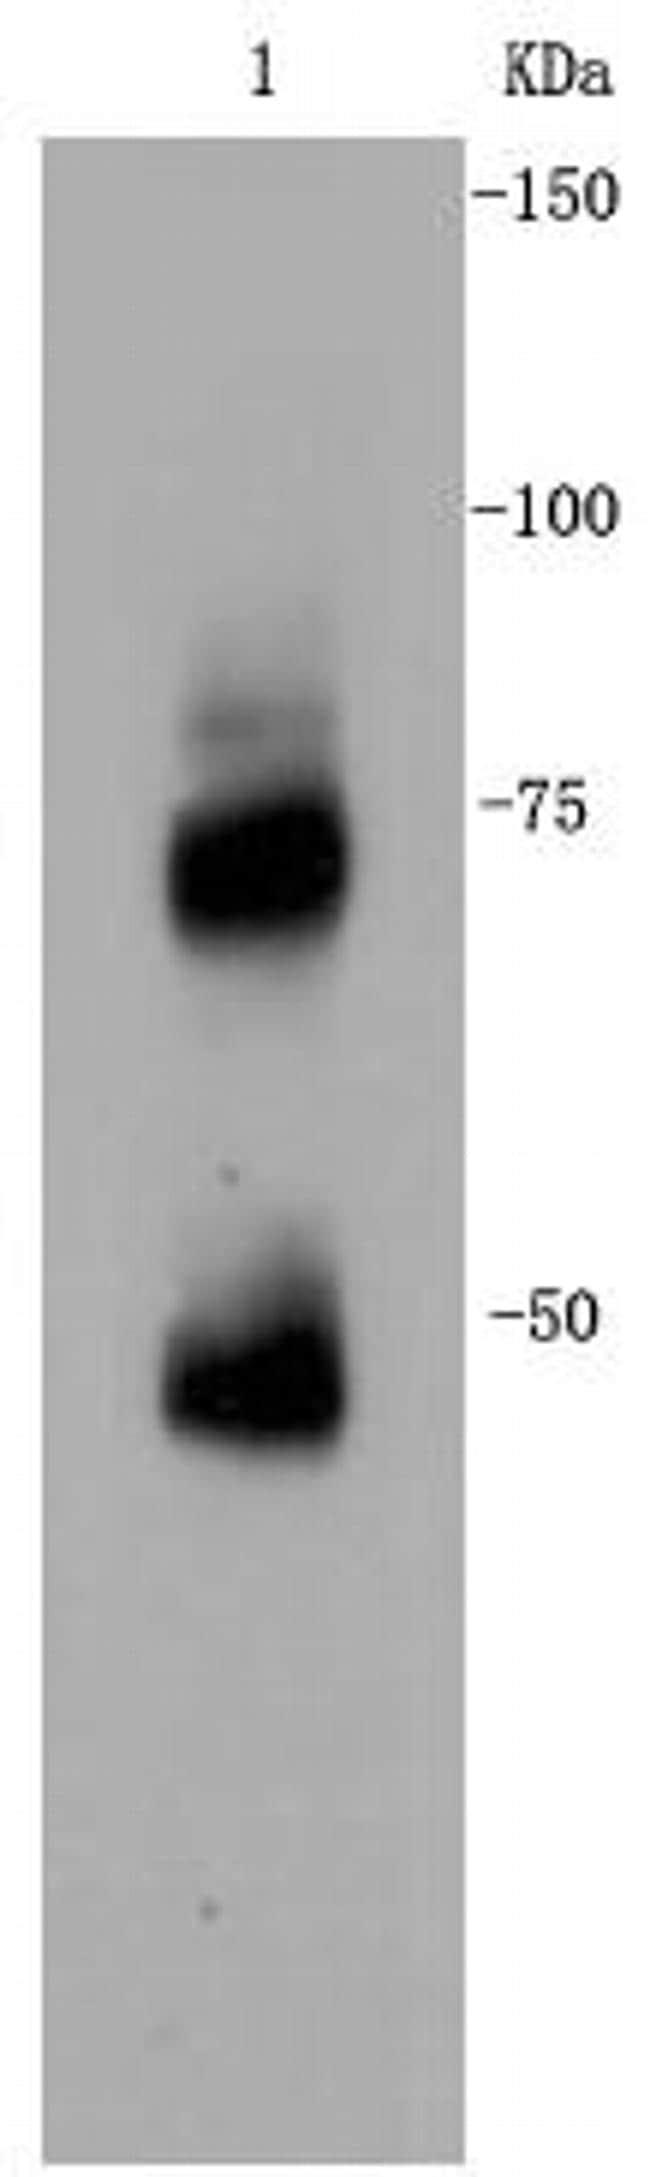 CD271 (NGF Receptor) Antibody in Western Blot (WB)